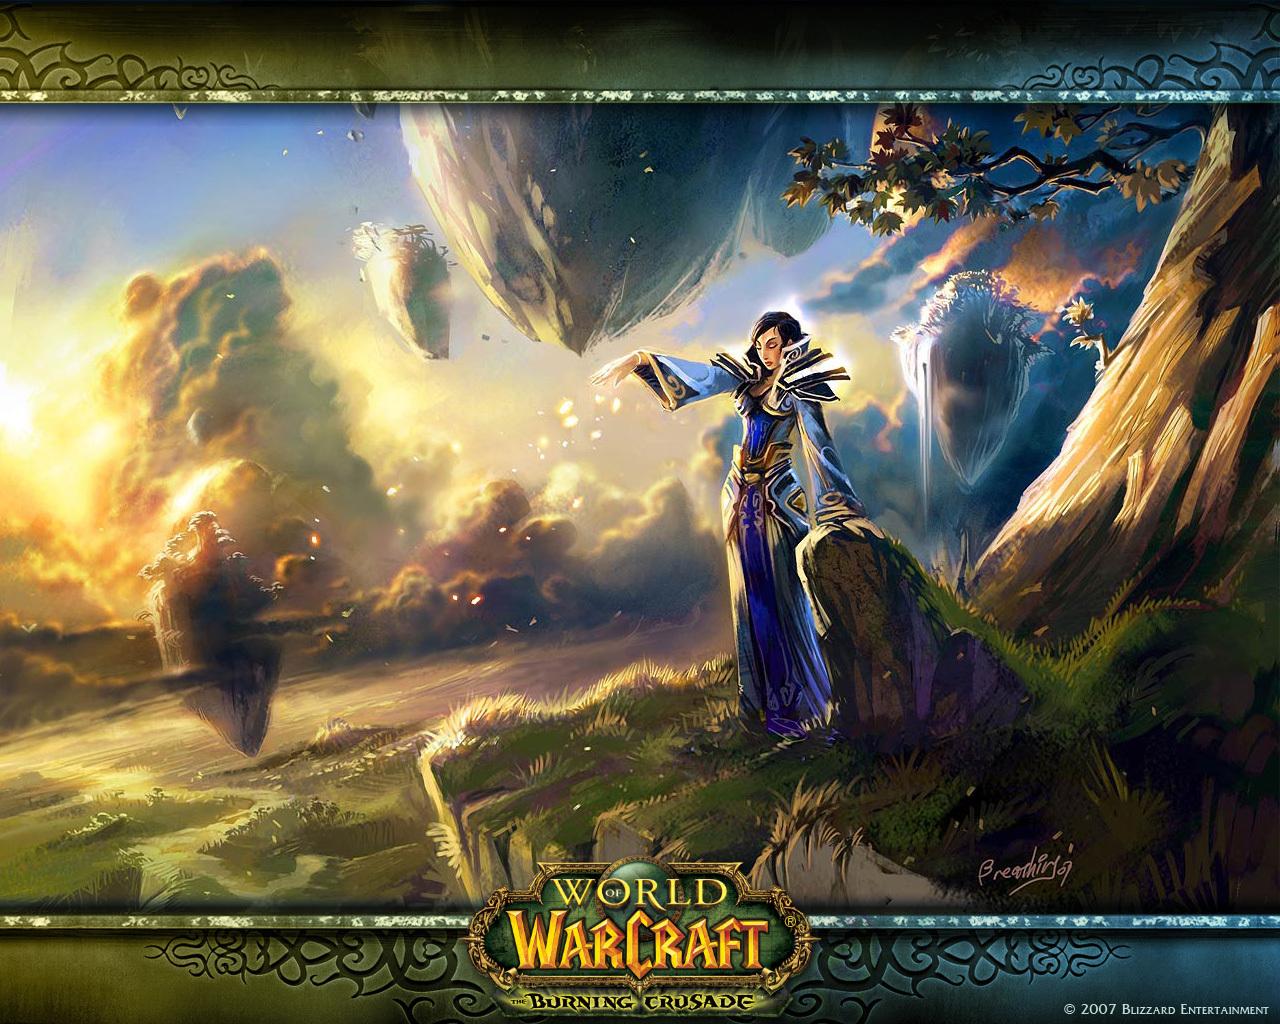 World of Warcraft   World of Warcraft Wallpaper 2067977 1280x1024